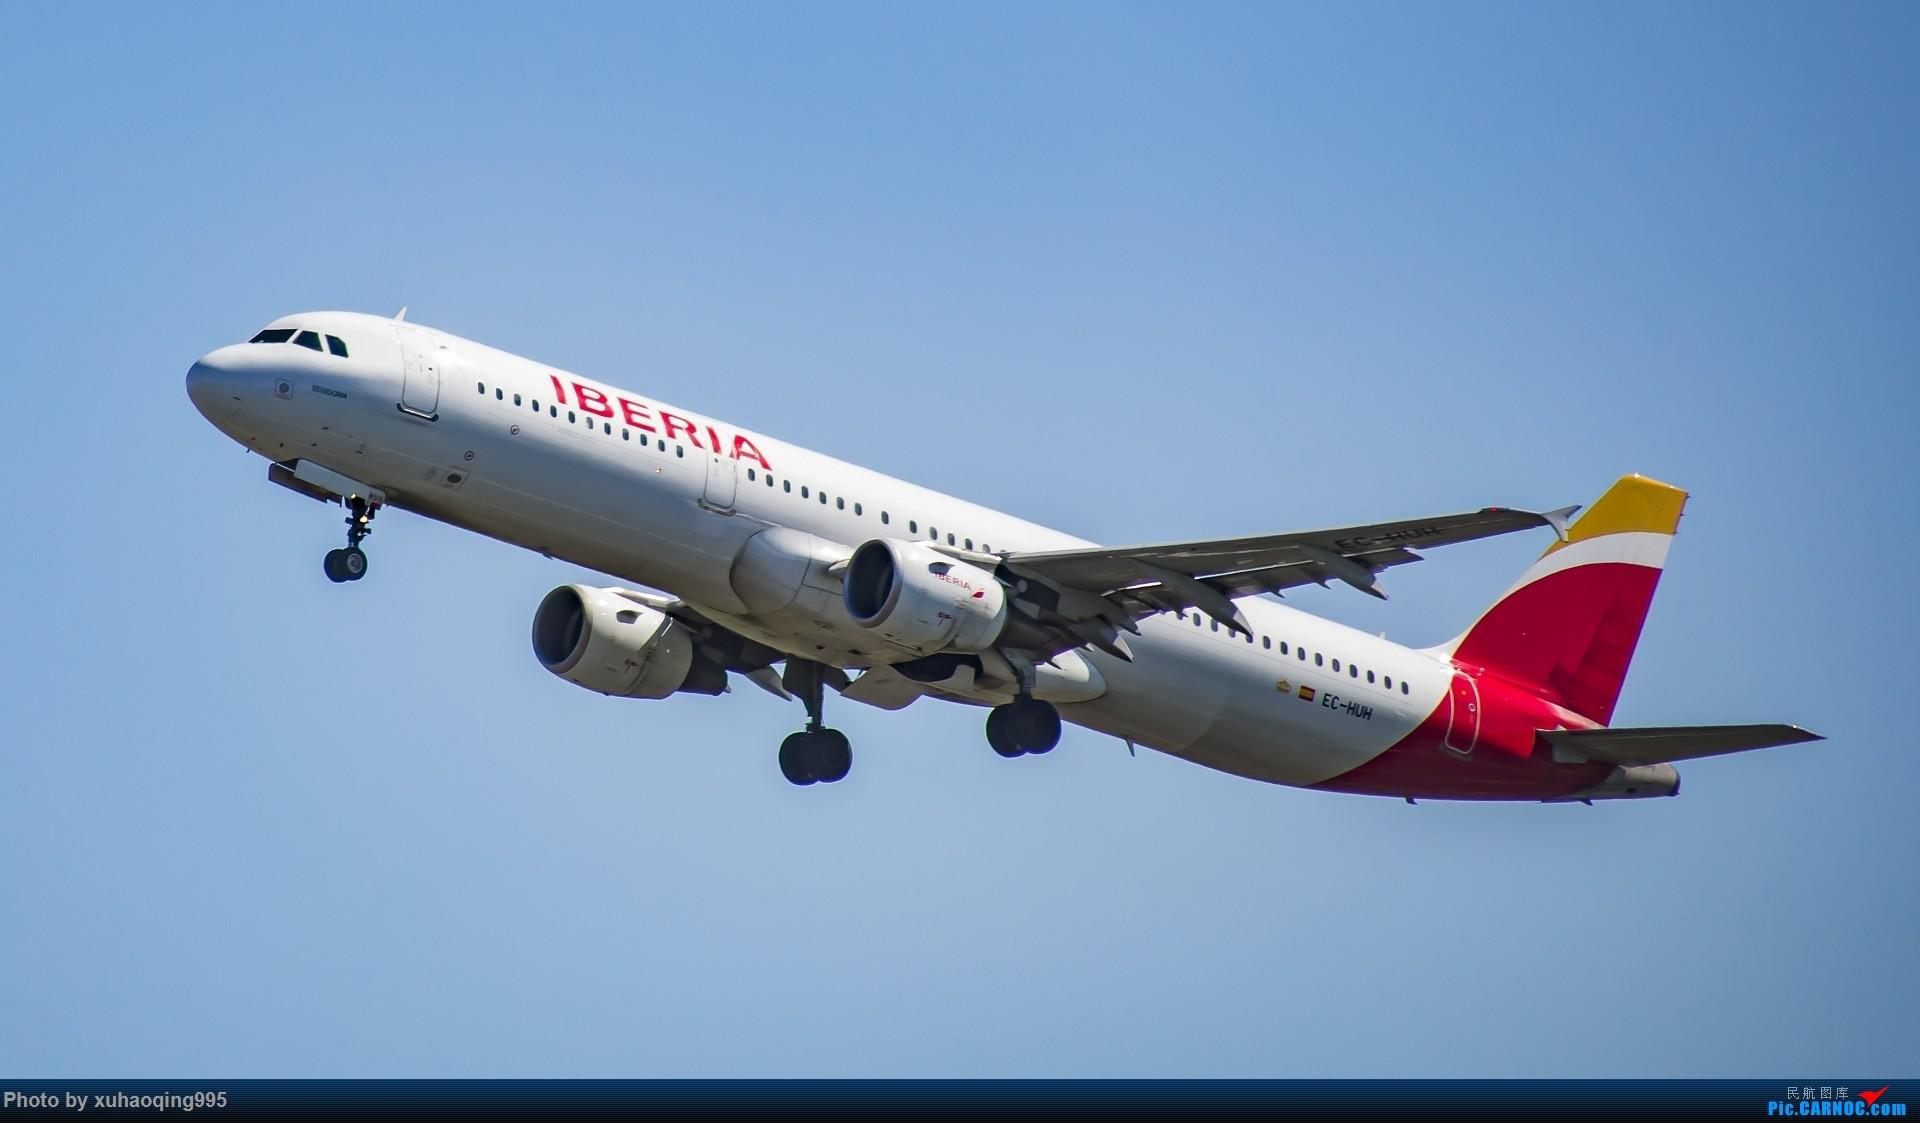 Re:[原创]罗马机场(FCO)拍机 AIRBUS A321 EC-HUH 意大利菲乌米奇诺机场